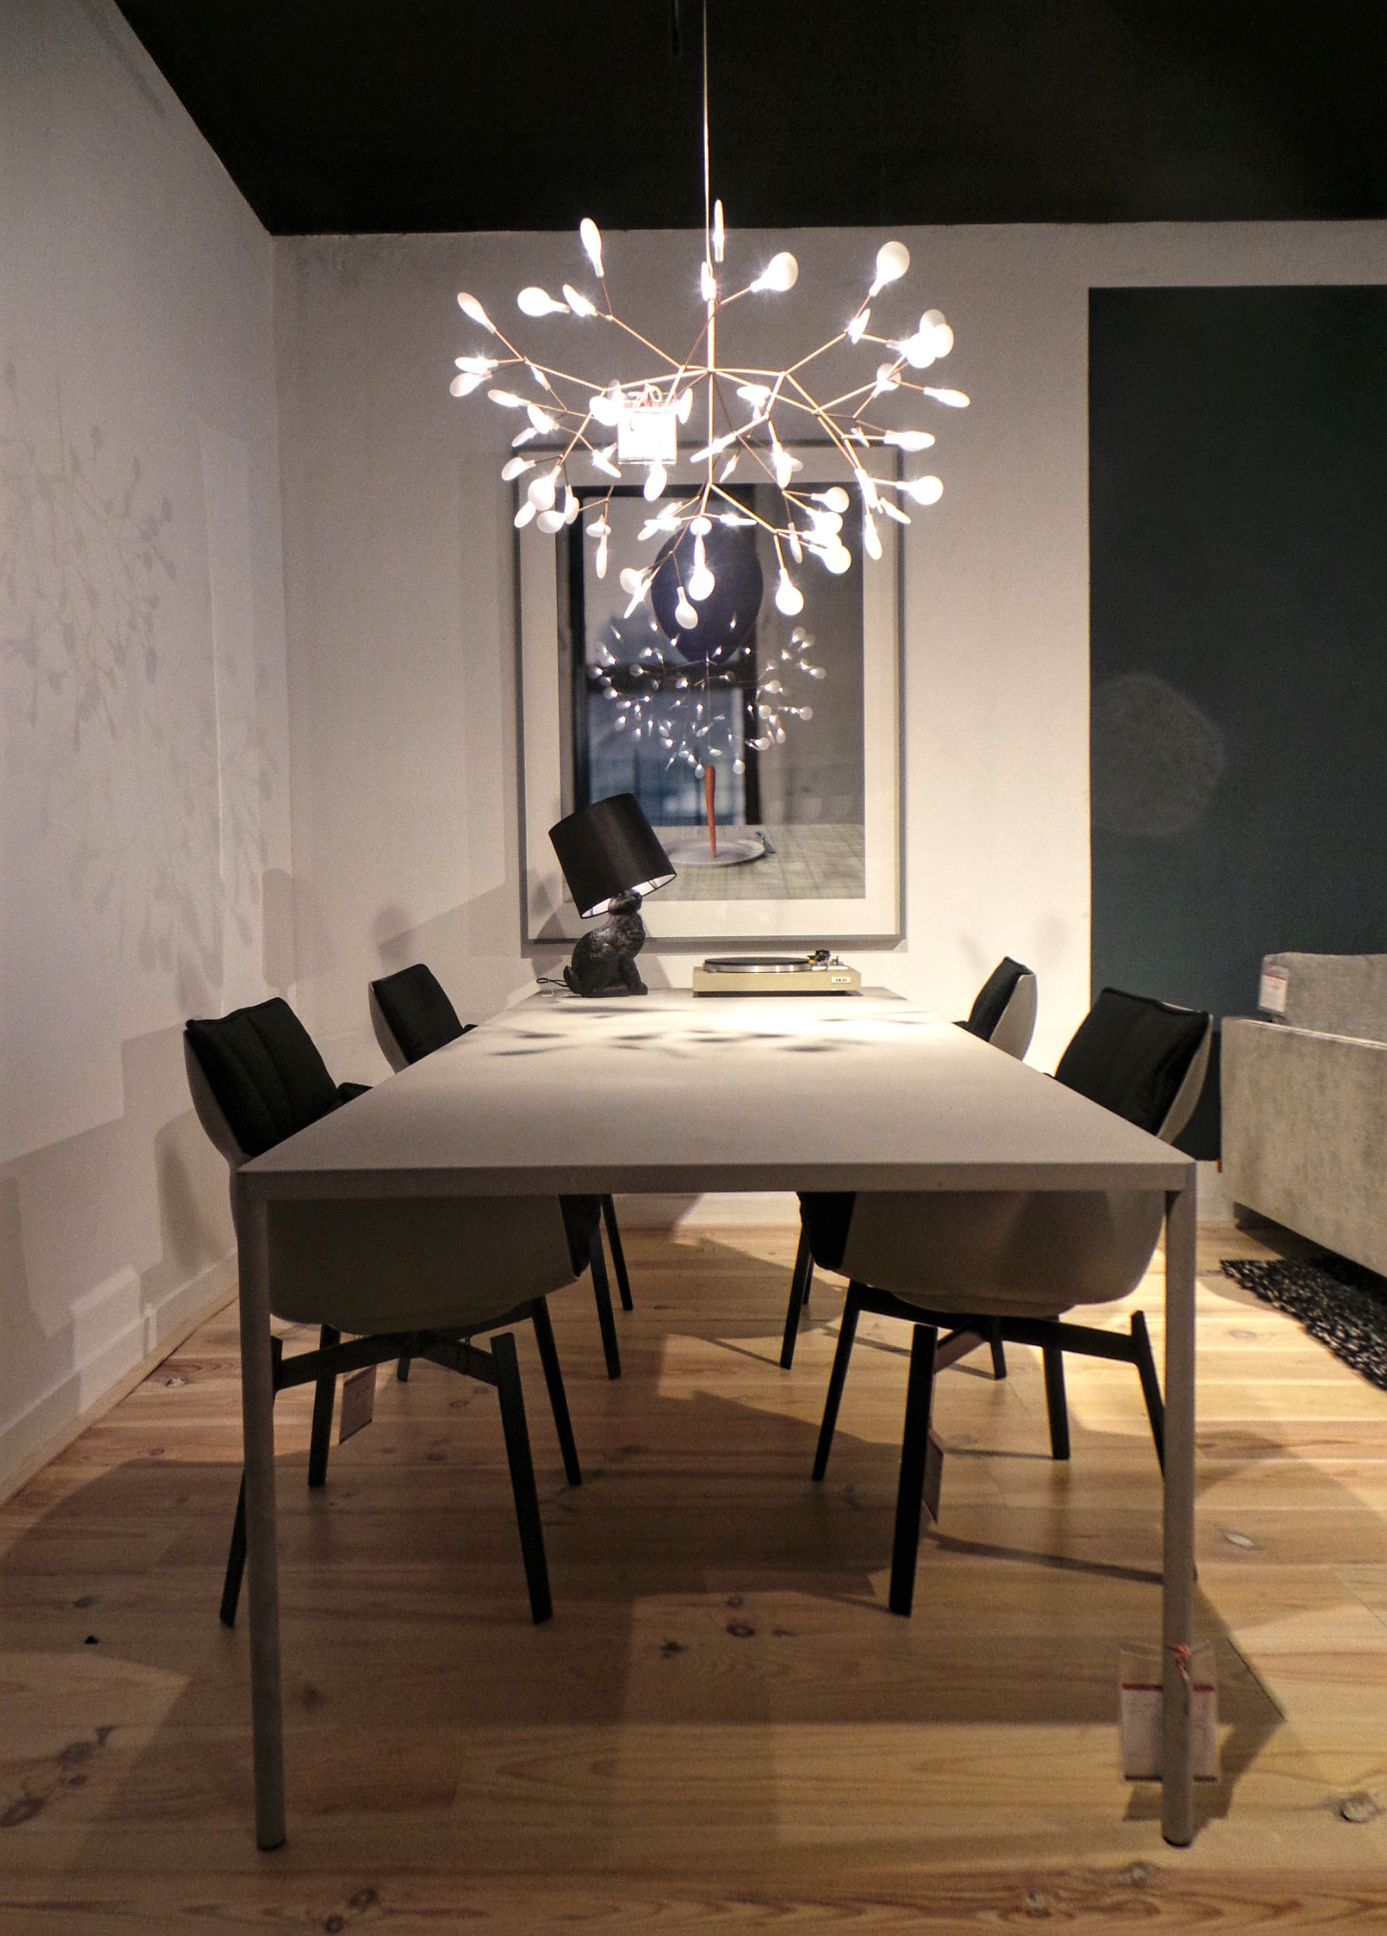 Dining Room Table Lamps Bb Italia Chair Mdf Table Moooi Table Lamp Hanneke Huisman